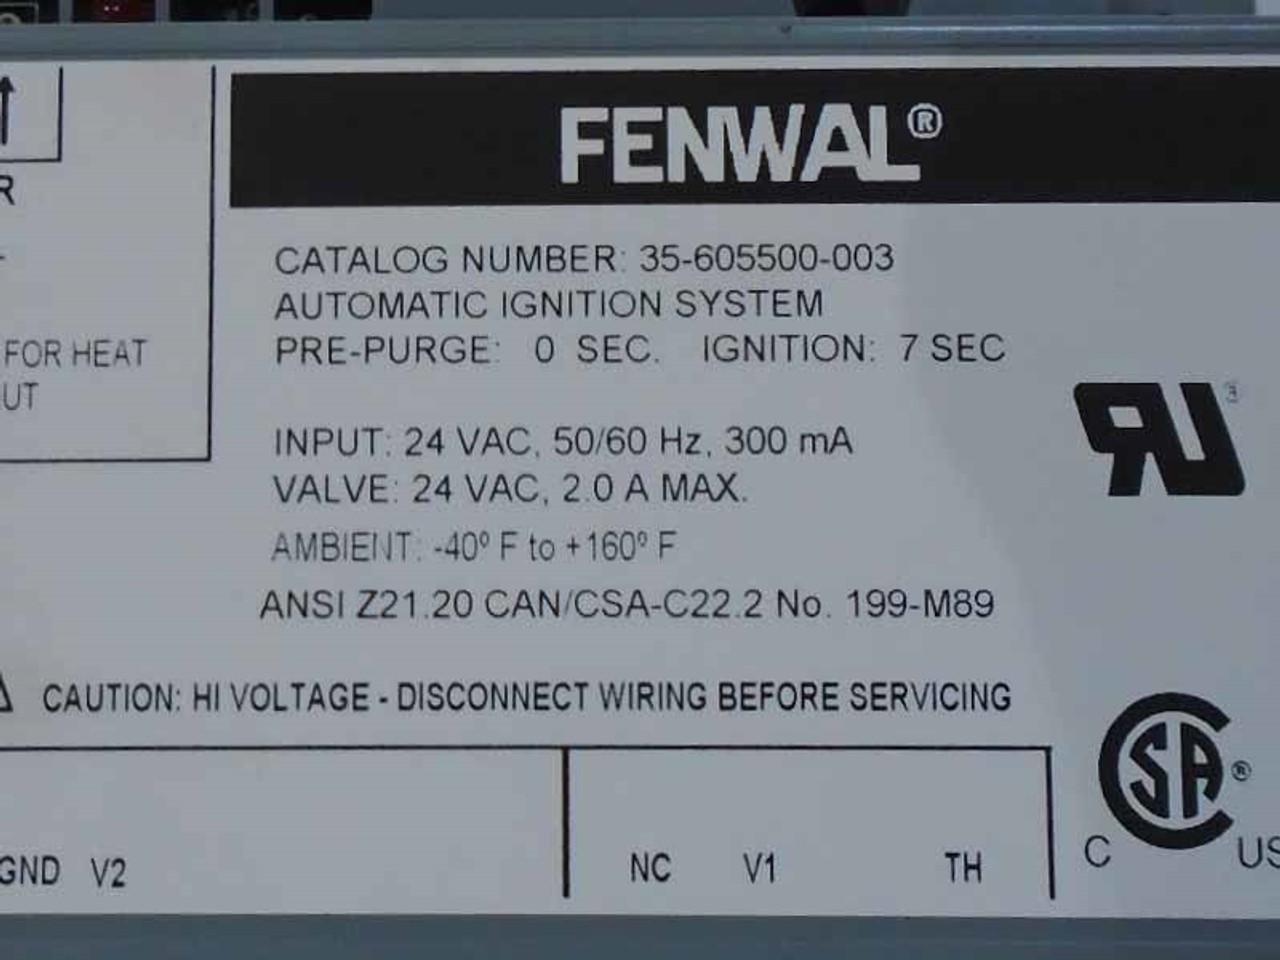 Fmi Fenwal Ignition Control Module J6826rhstovepartsunlimited: Fenwal Ignition System Wiring Diagram At Gmaili.net